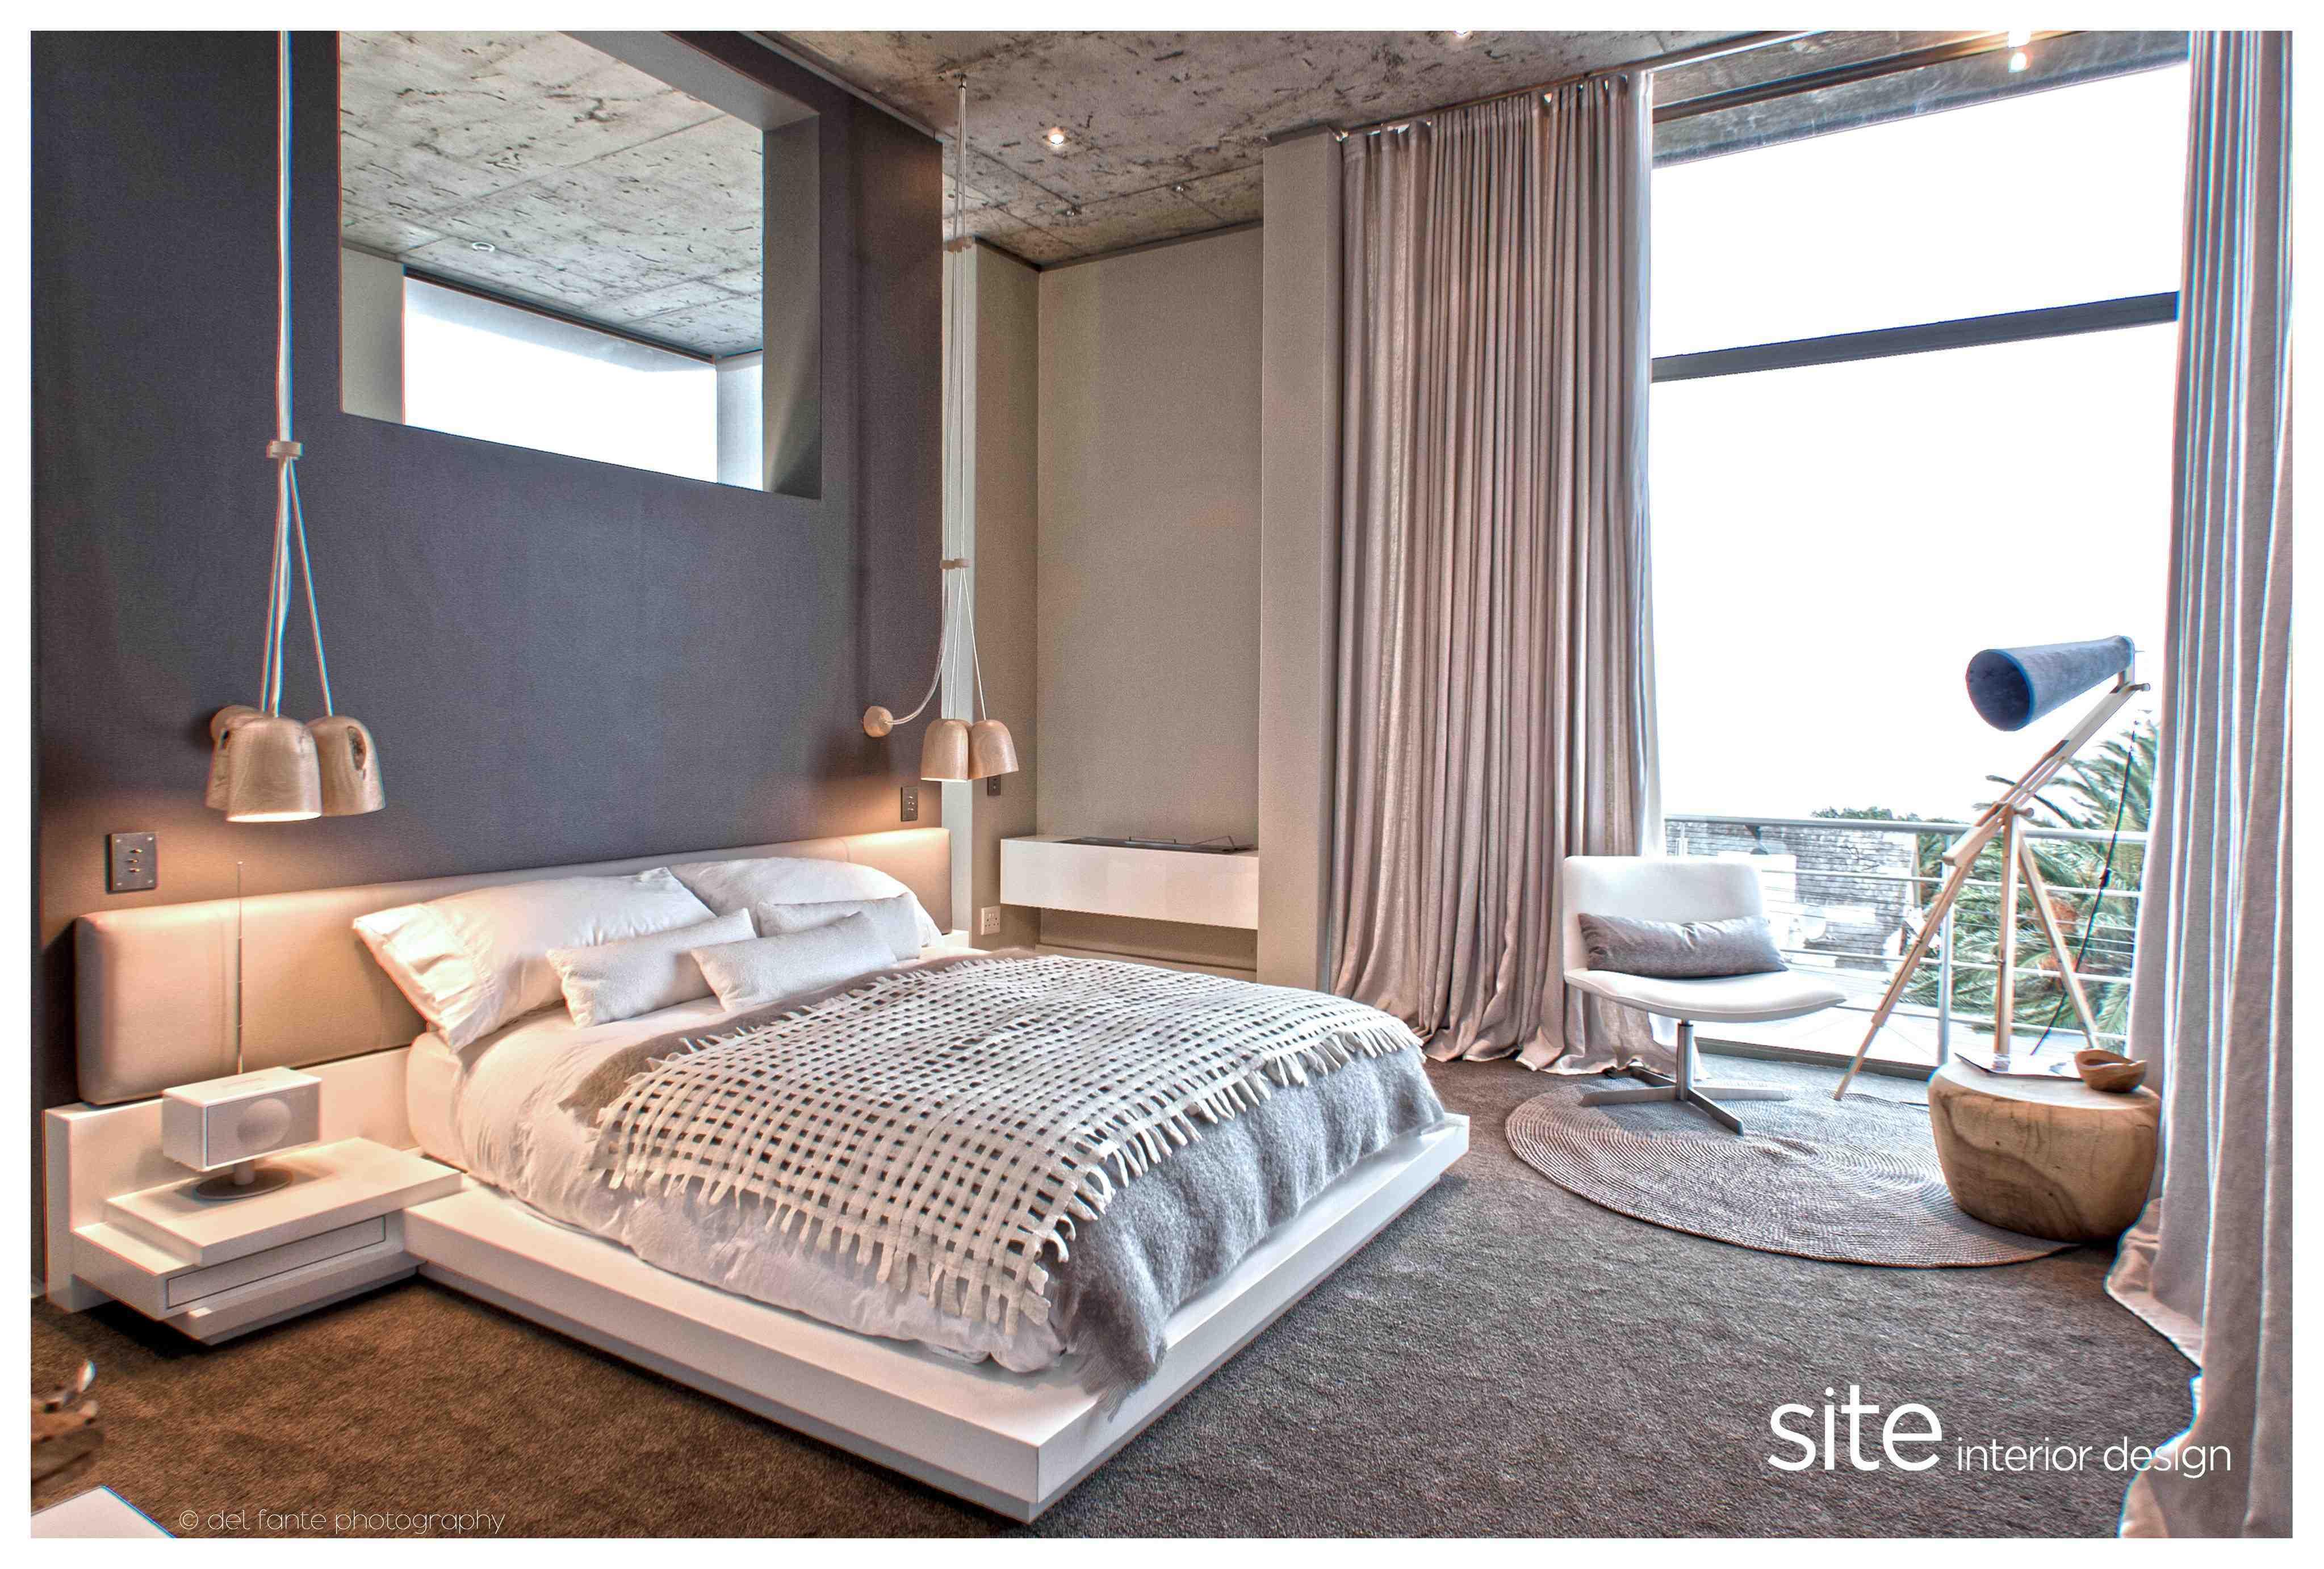 Installations fibre designs Interior design website ideas